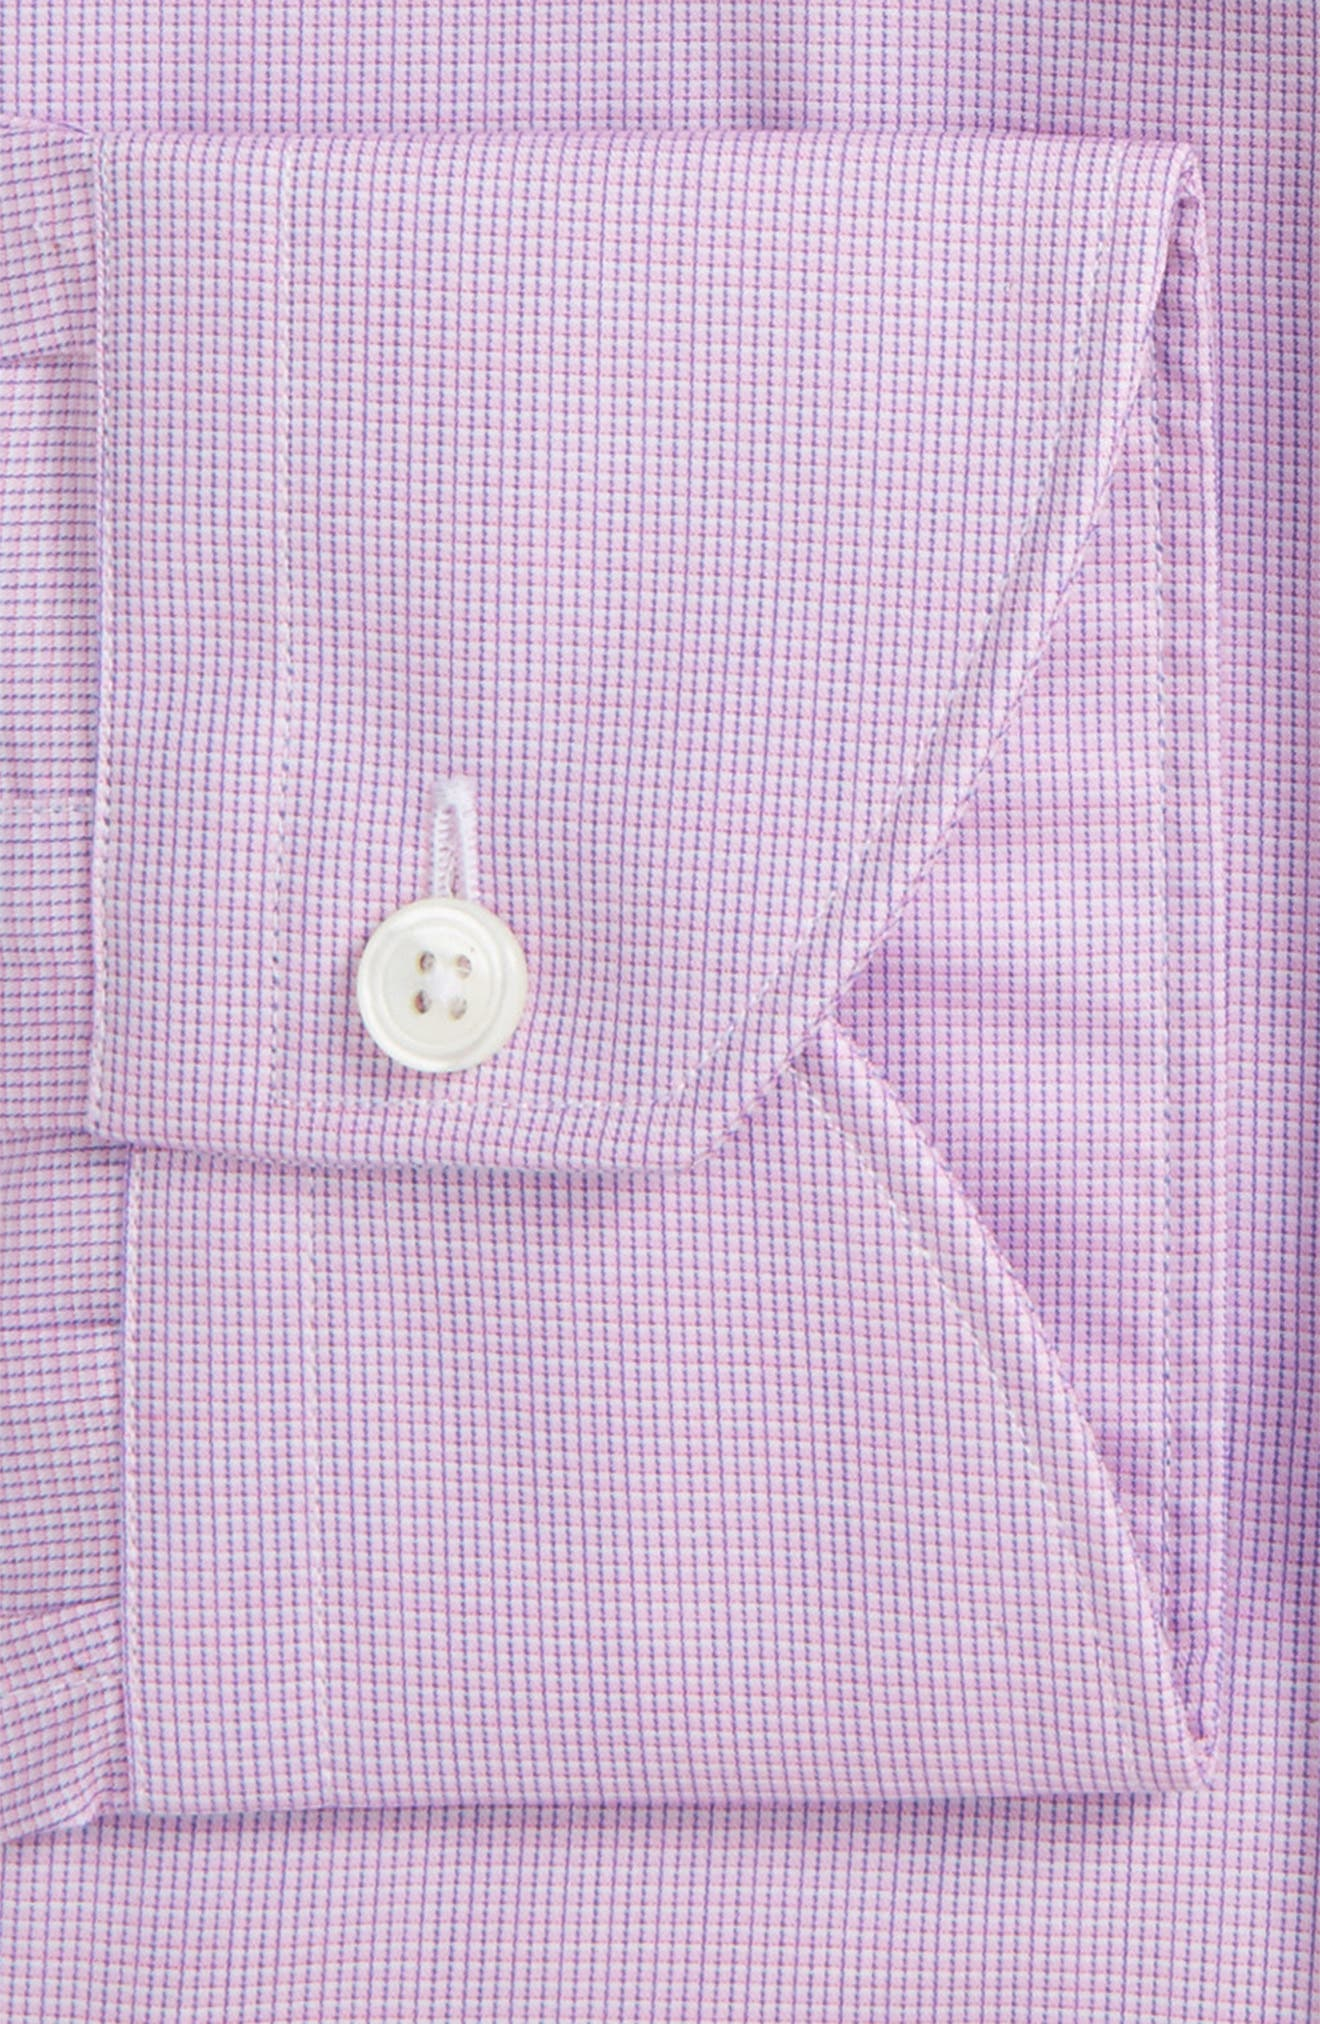 Regular Fit Check Dress Shirt,                         Main,                         color, 530